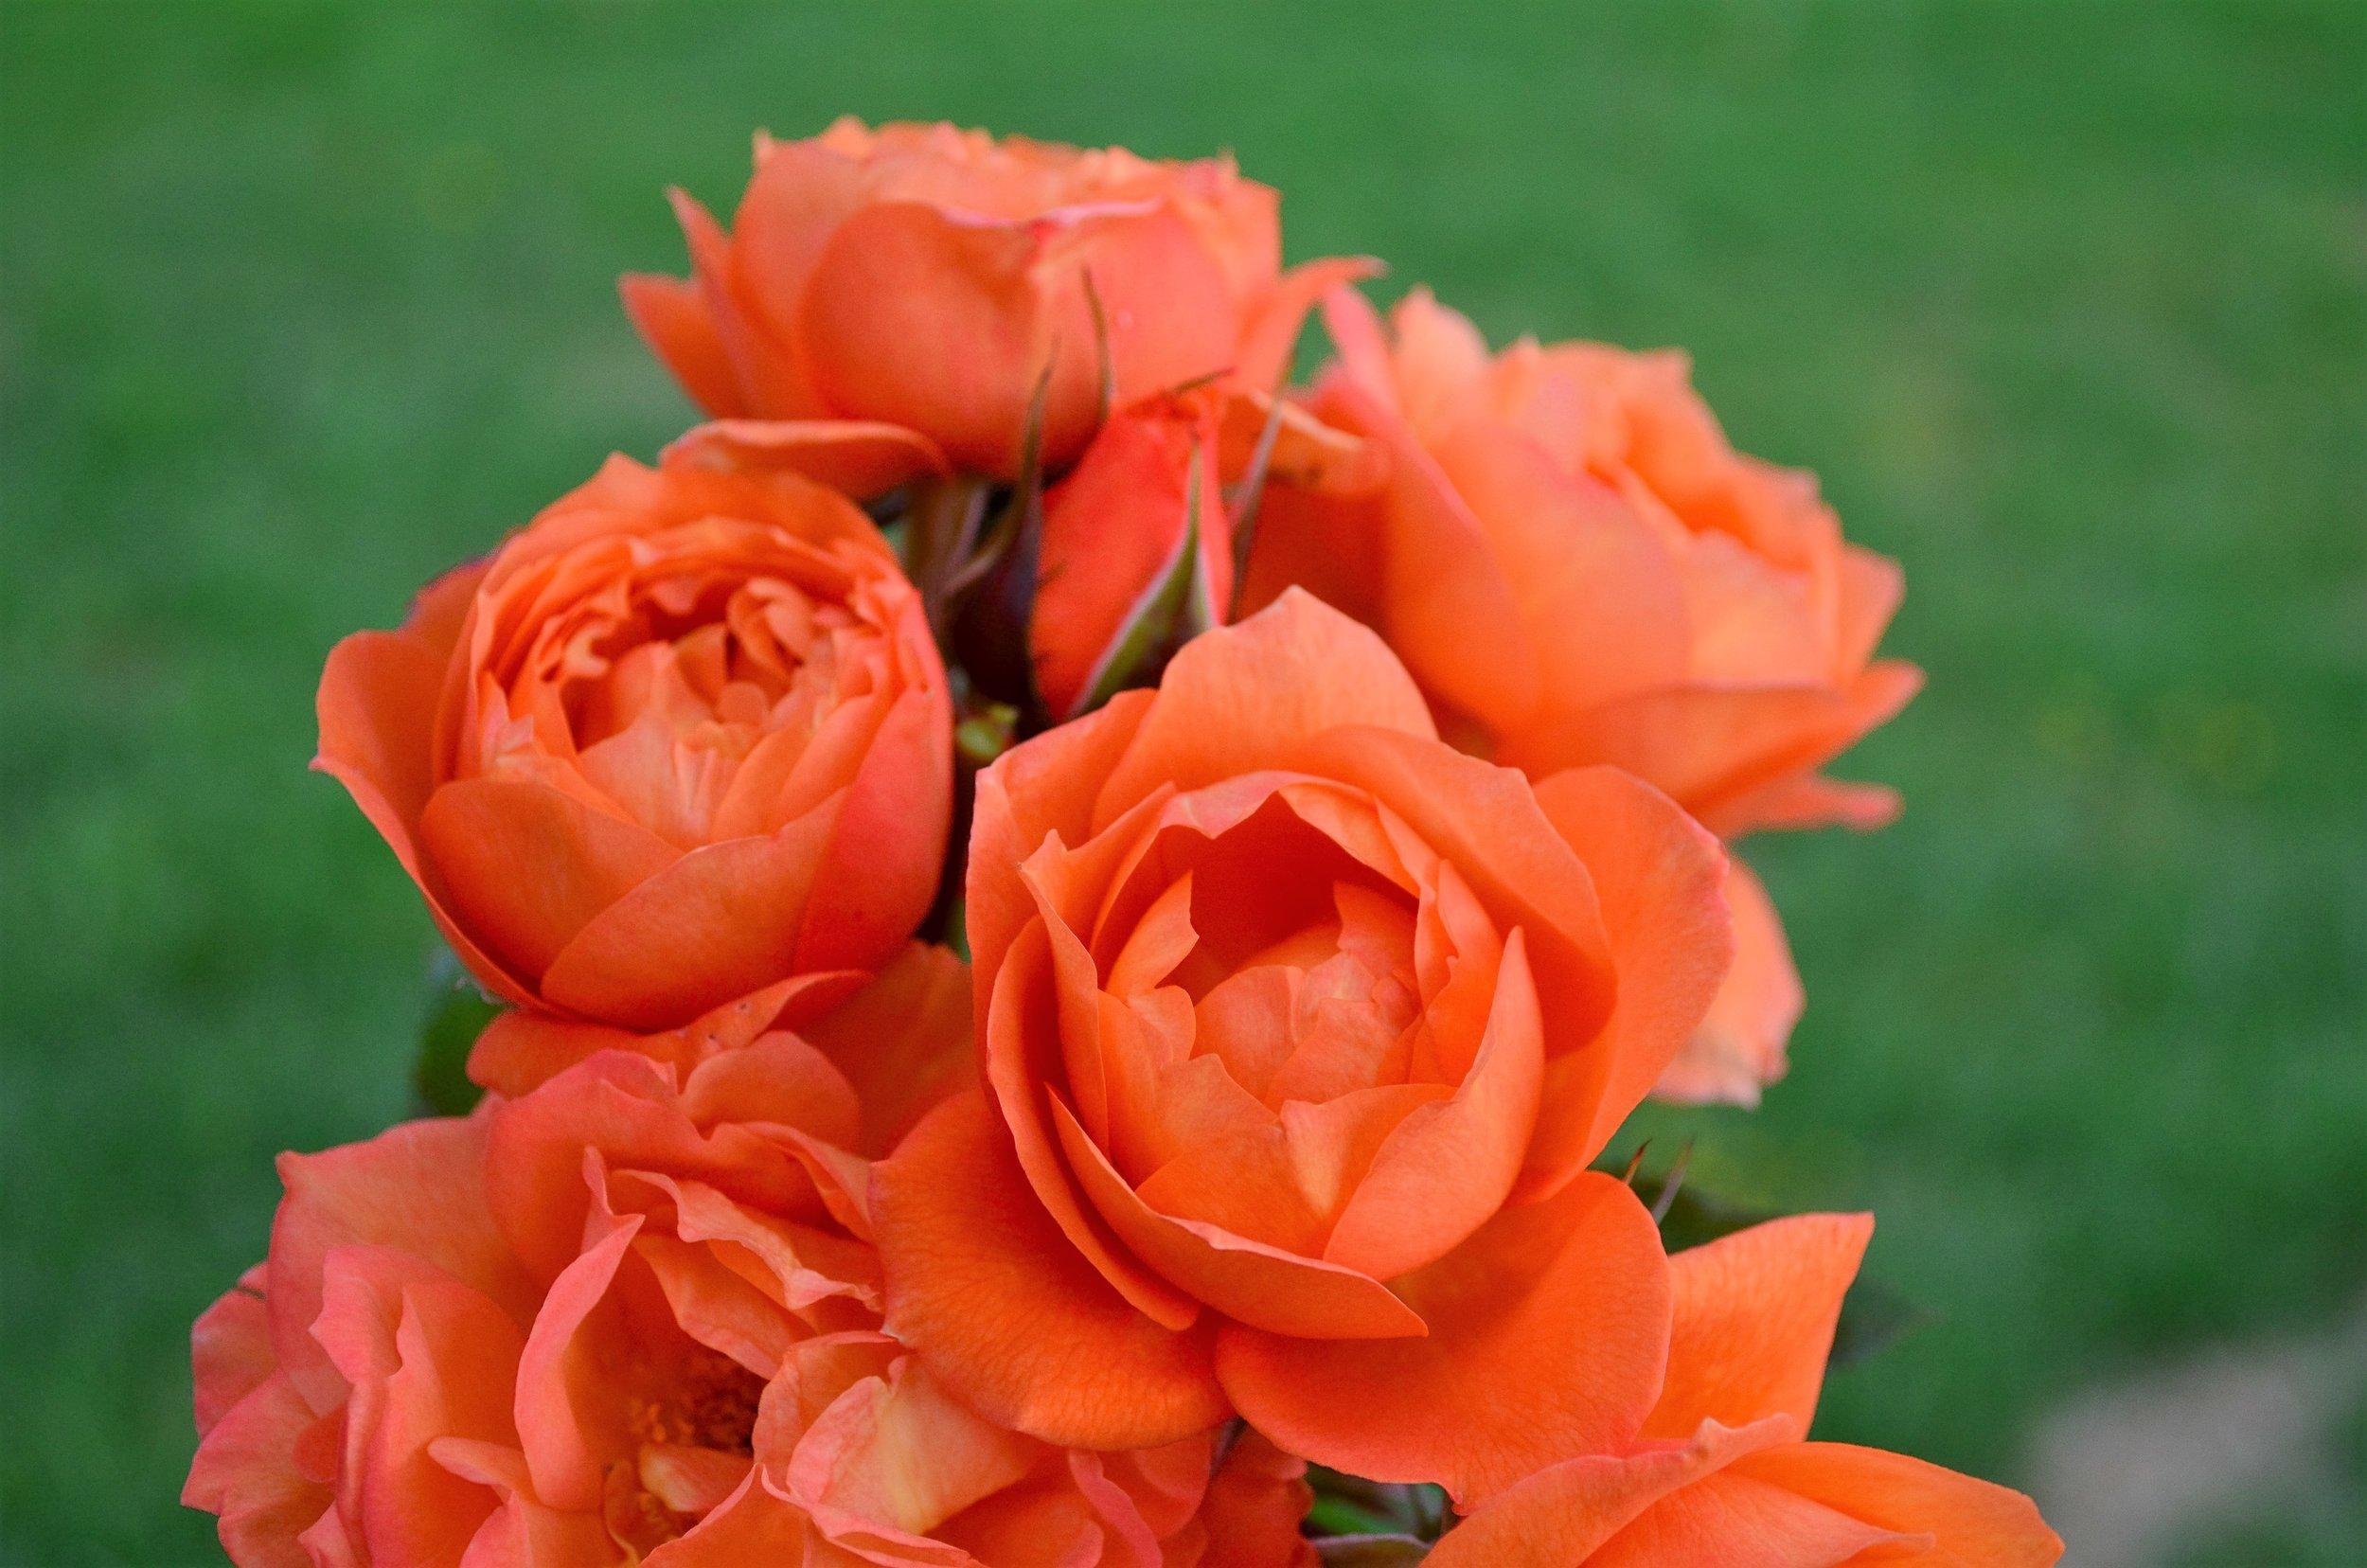 Rose #12.JPG